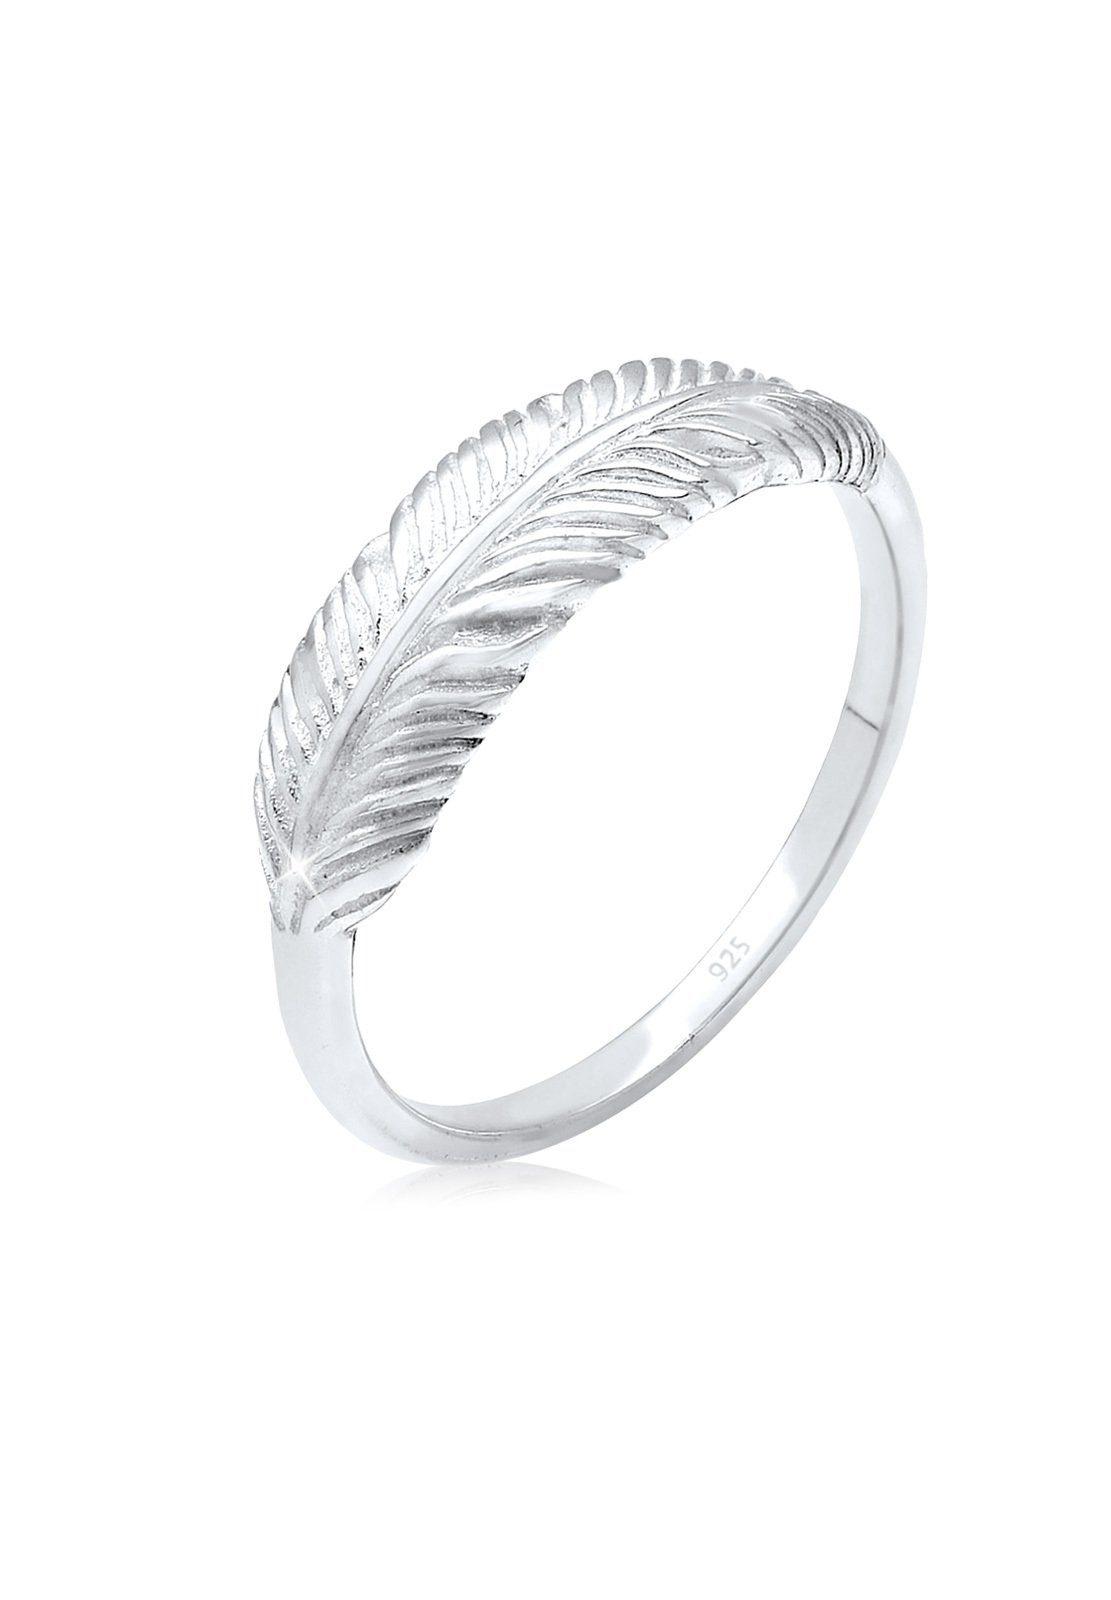 Elli Ring Feder Flgel Boho Trend 925 Sterling Silber online kaufen  OTTO